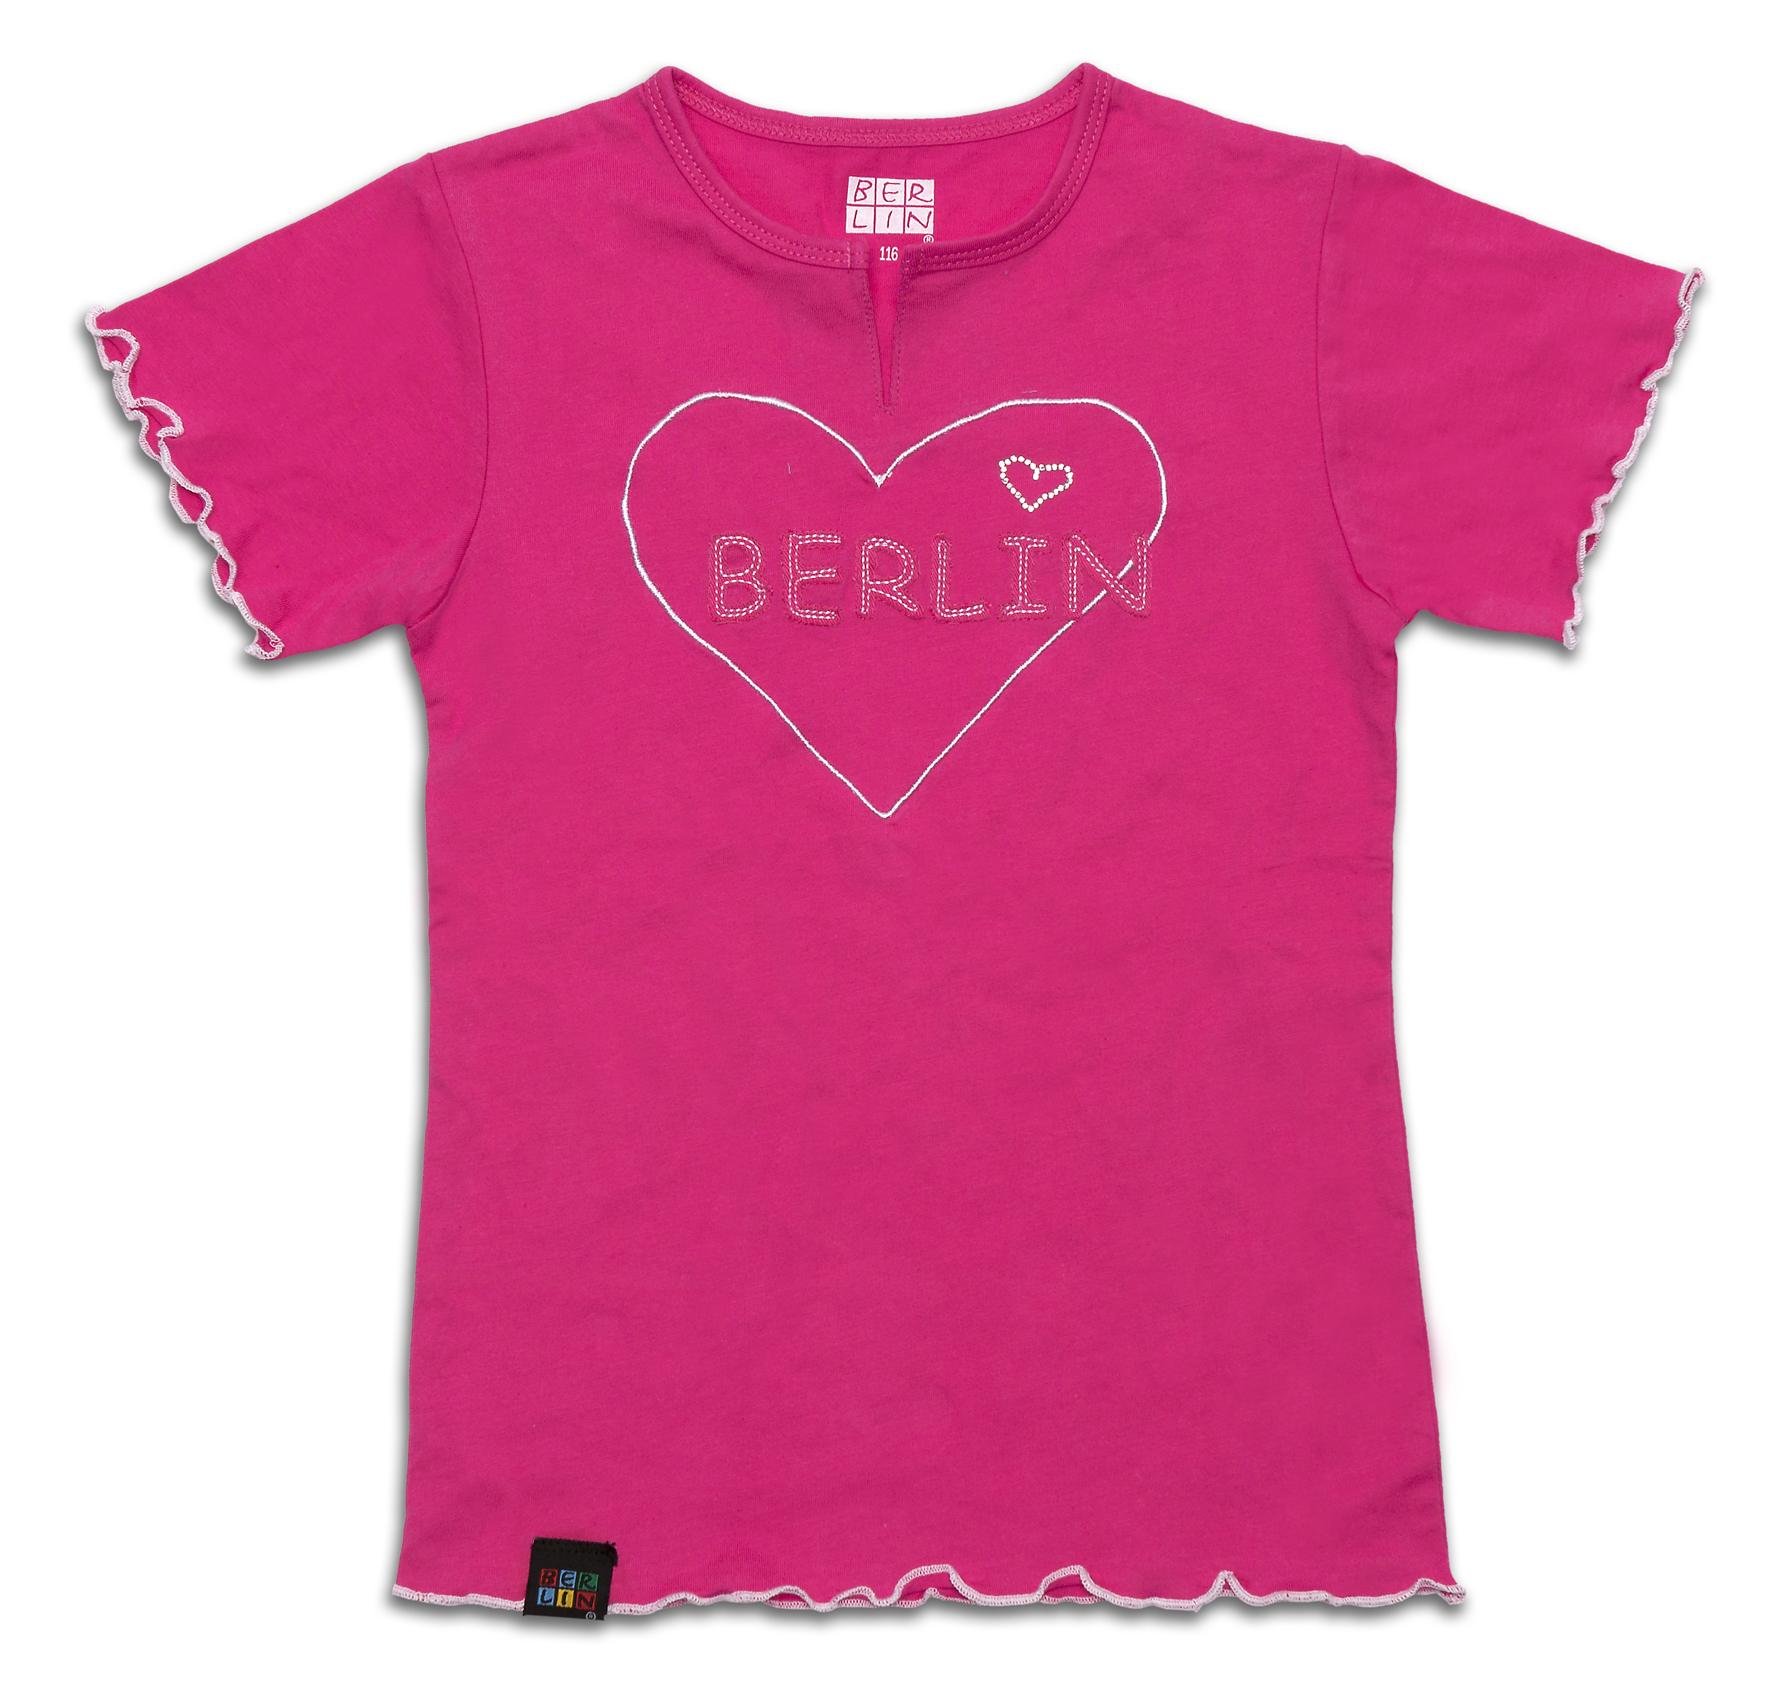 010-2943 Girly TS BERLIN Patch-pink